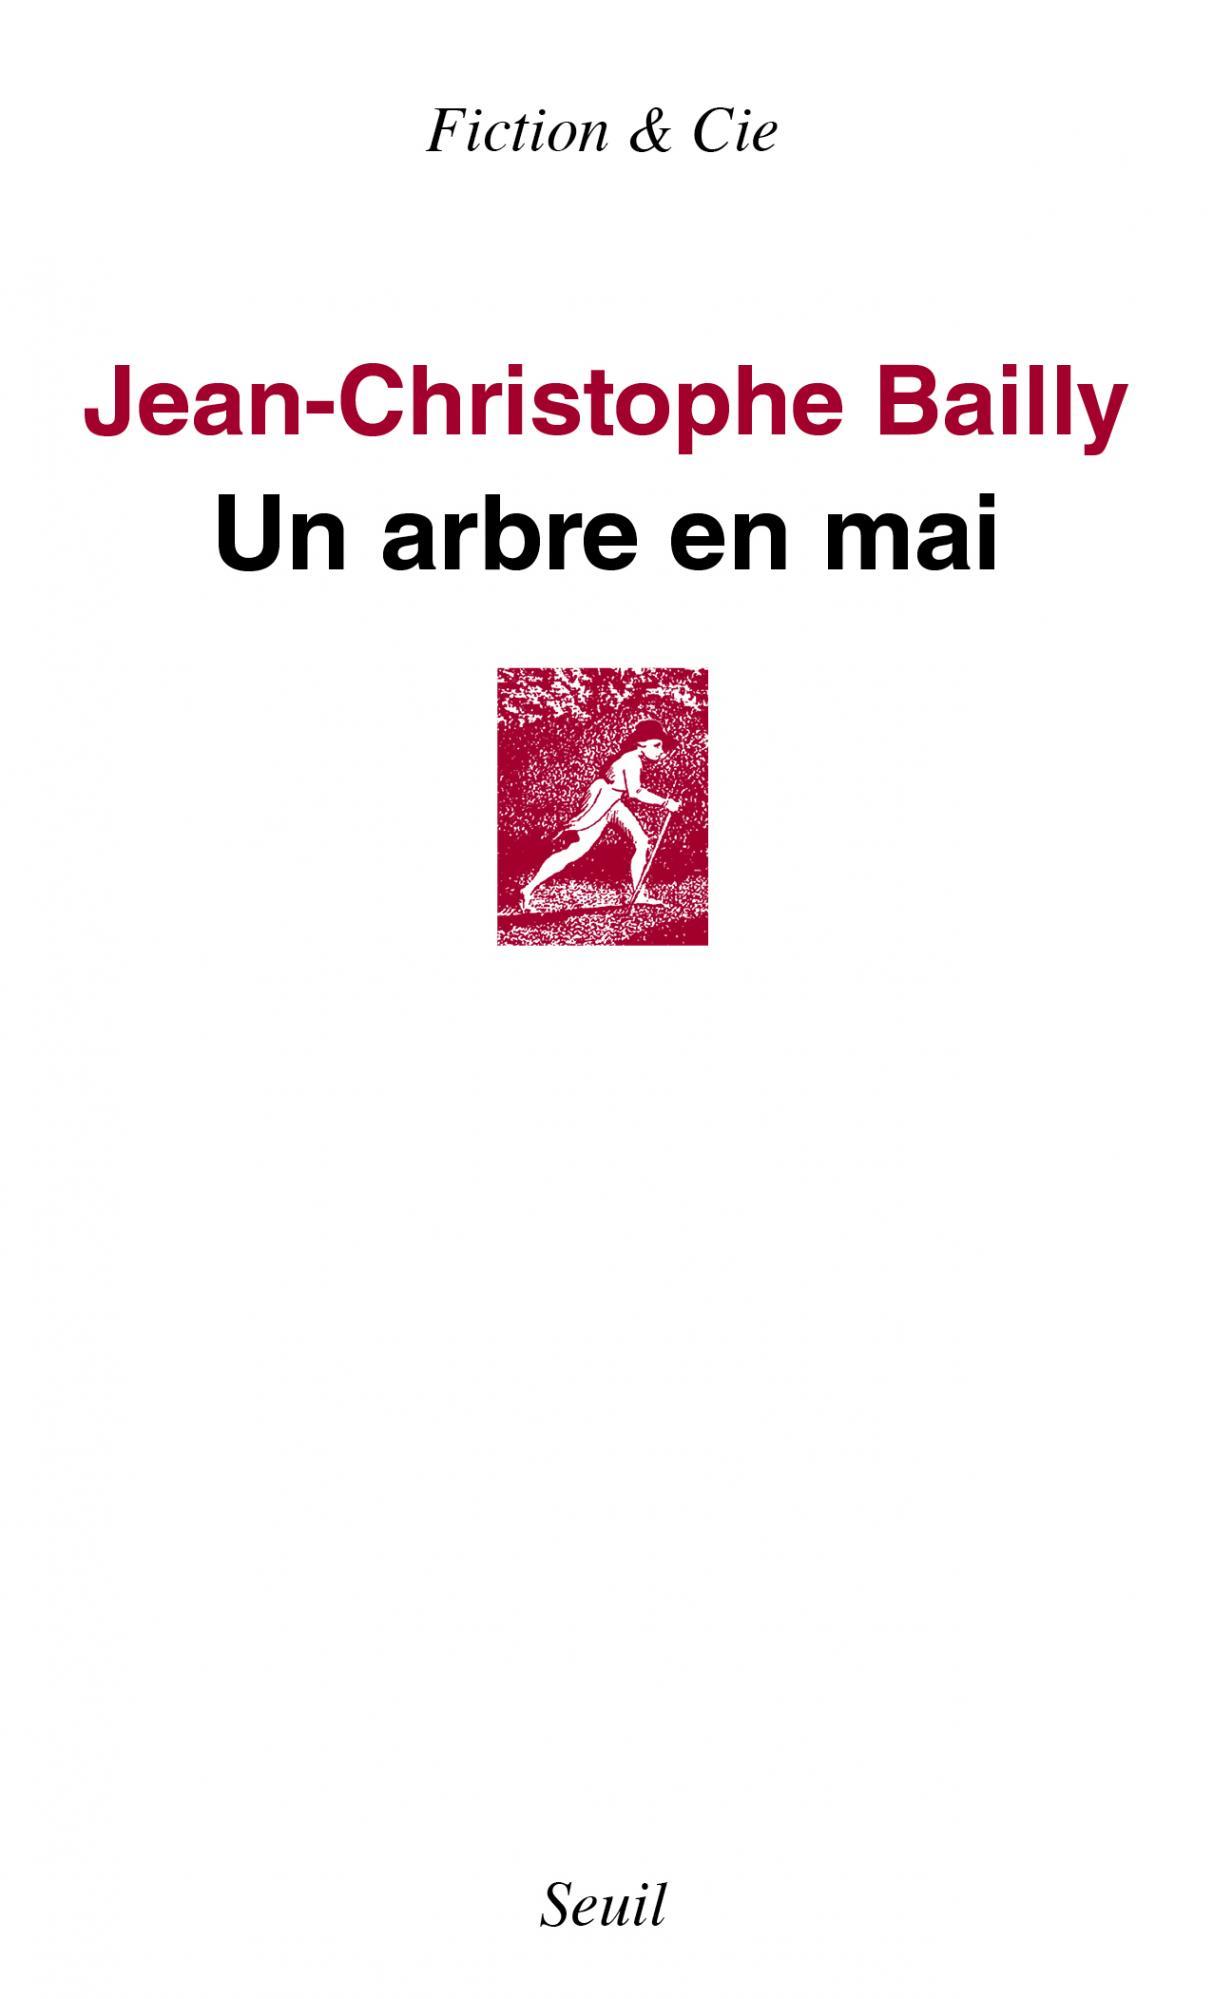 J.-C. Bailly, Un arbre en mai